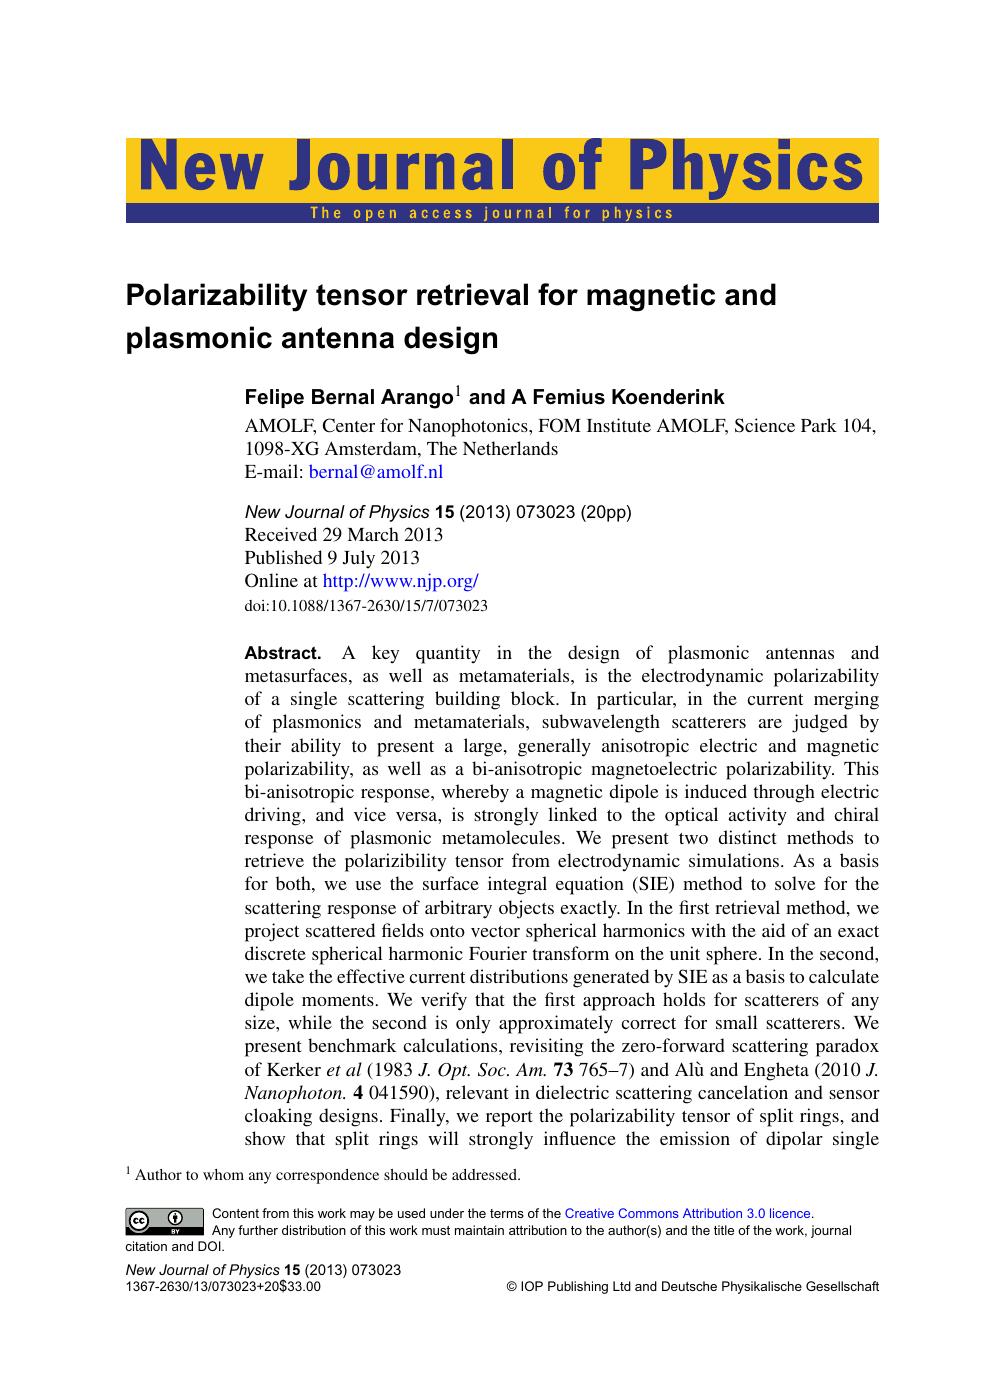 Polarizability tensor retrieval for magnetic and plasmonic